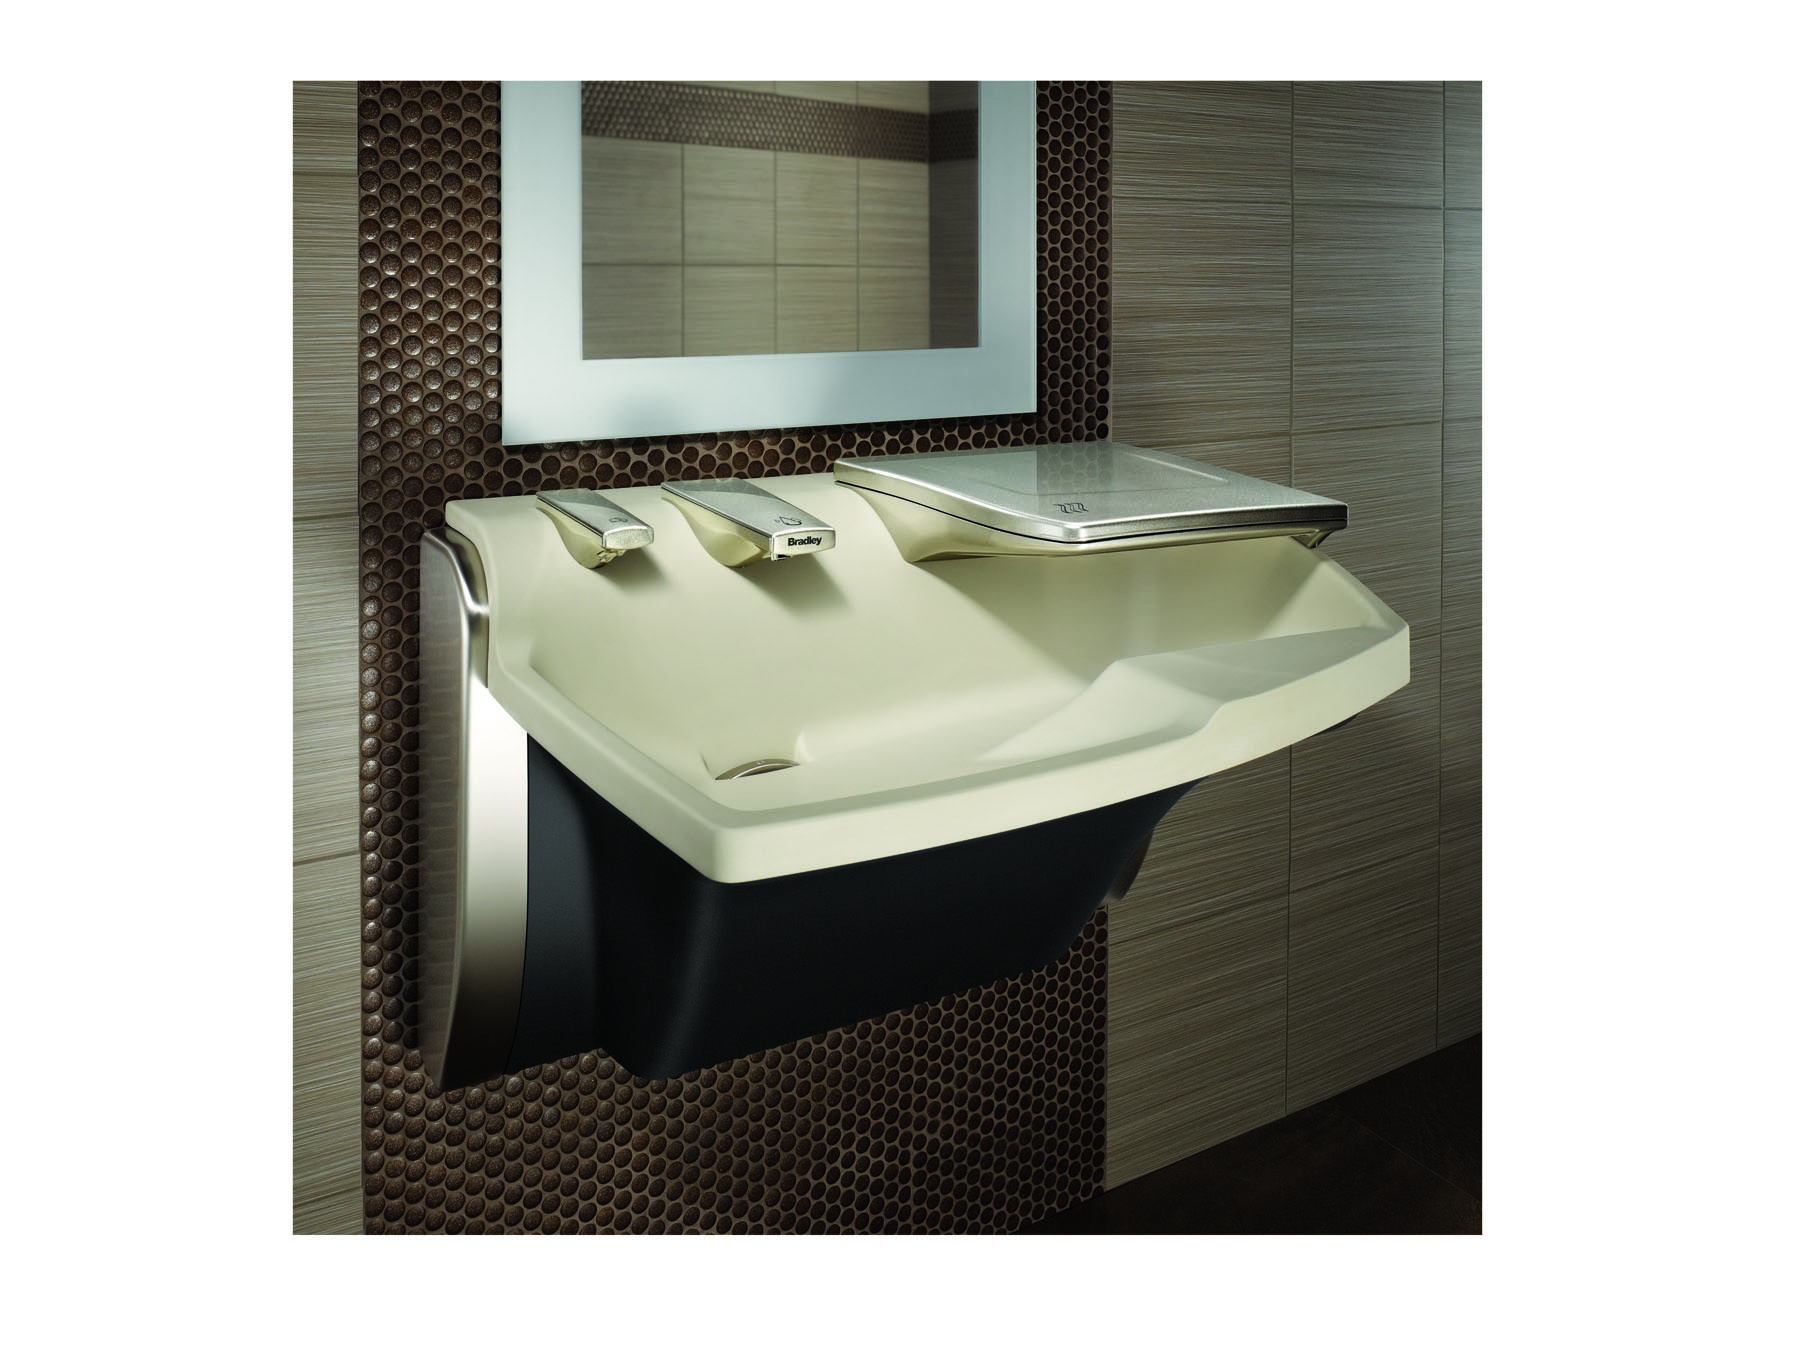 Bradley Sinks : Bradley Advocate AV-Series Lavatory System - retrofit